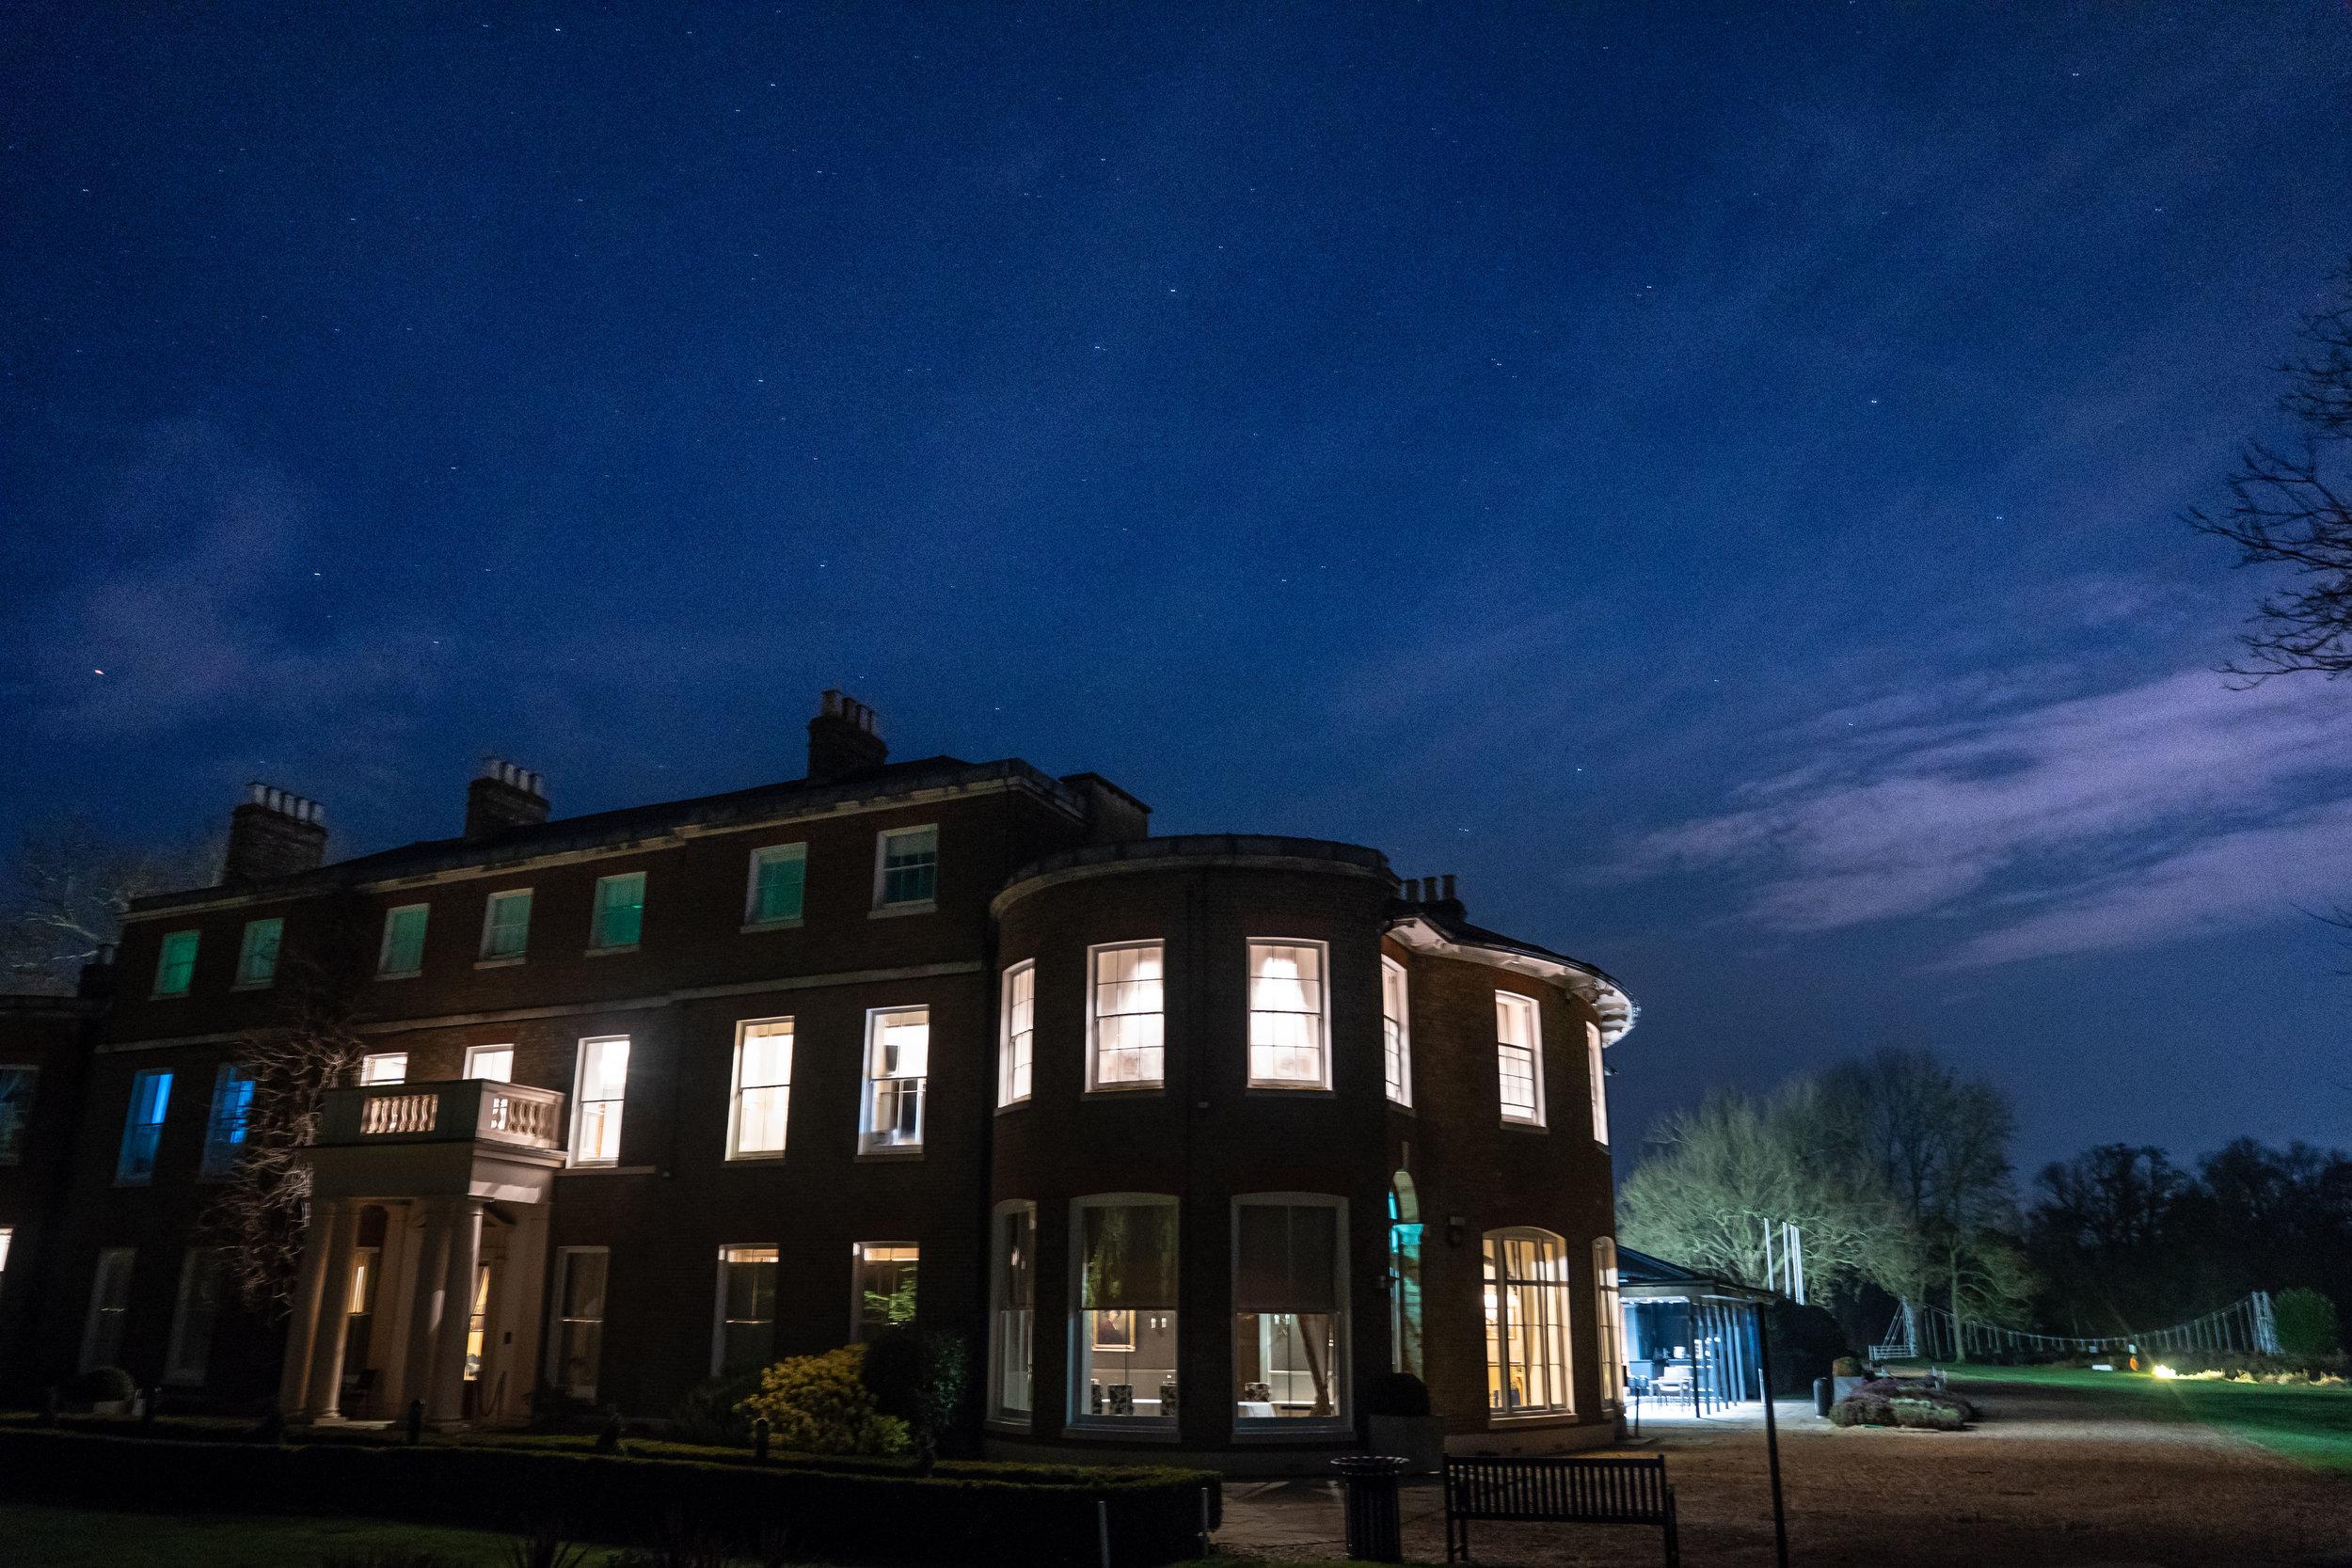 buckinghamshire-golf-club-winter-muslim-wedding-engagement-photography-videography-34